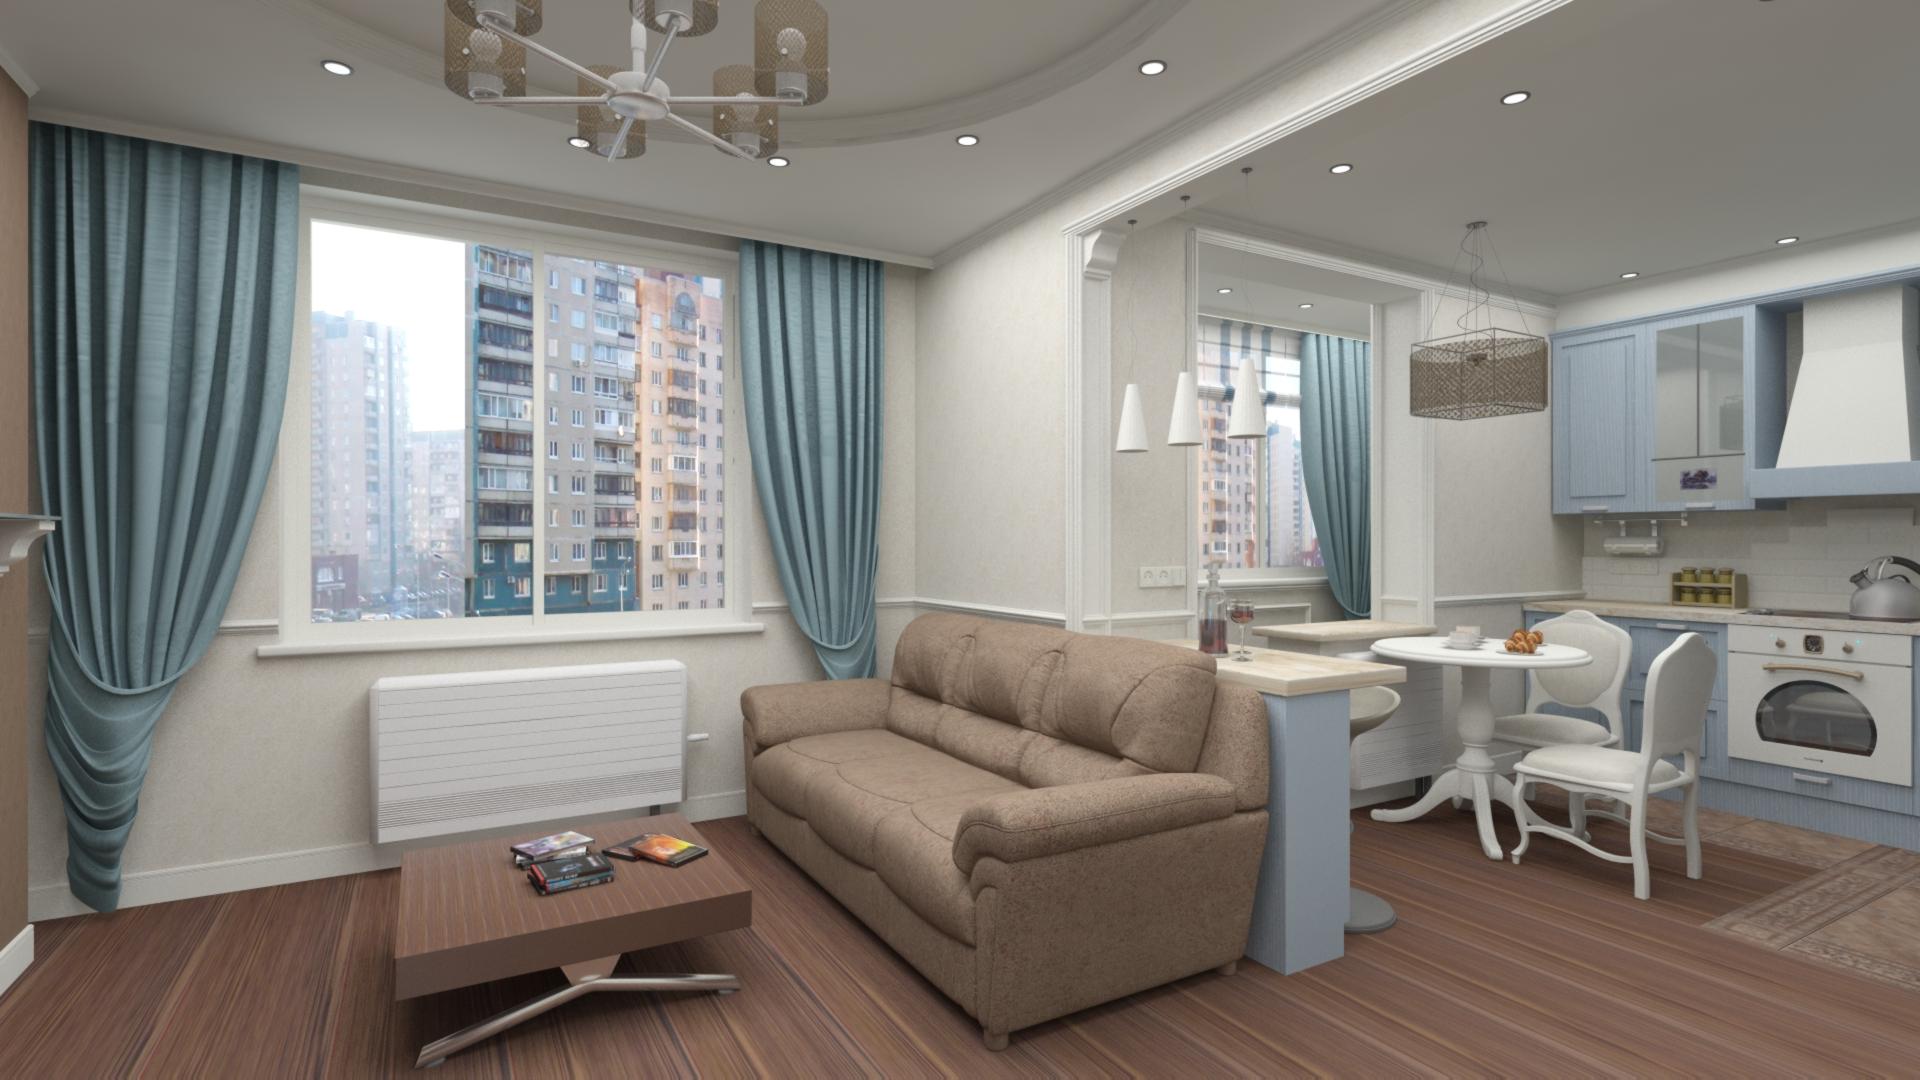 Двухкомнатная квартира  47 кв.м.